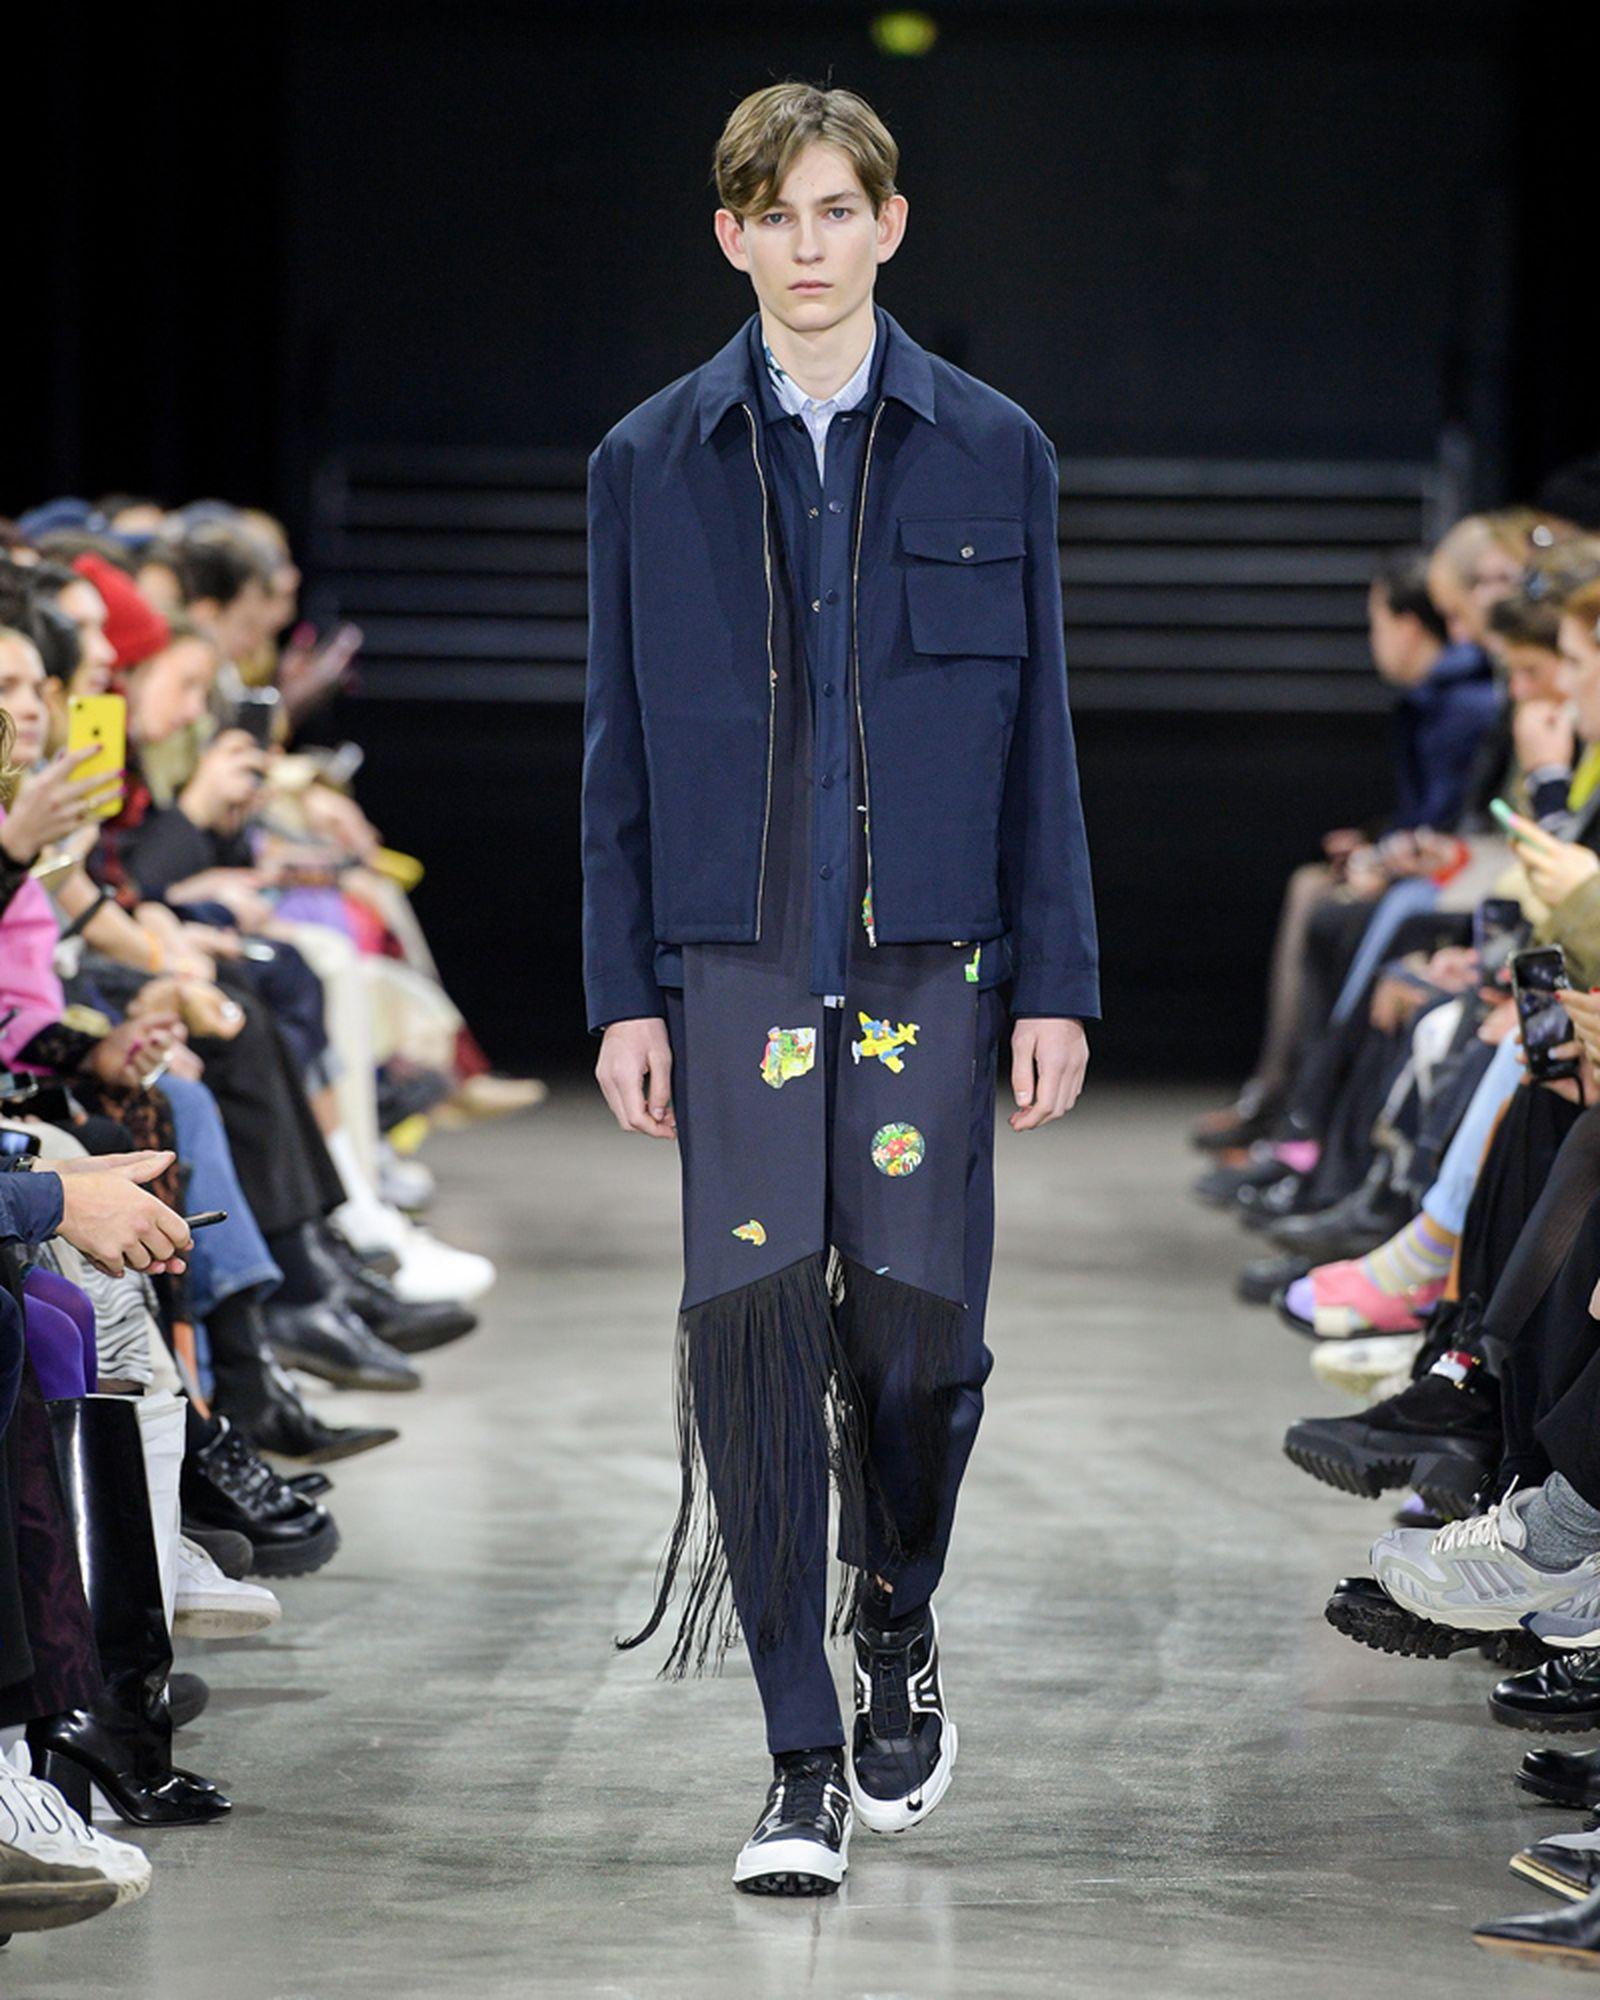 future-fashion-week-copenhagen-soulland-8